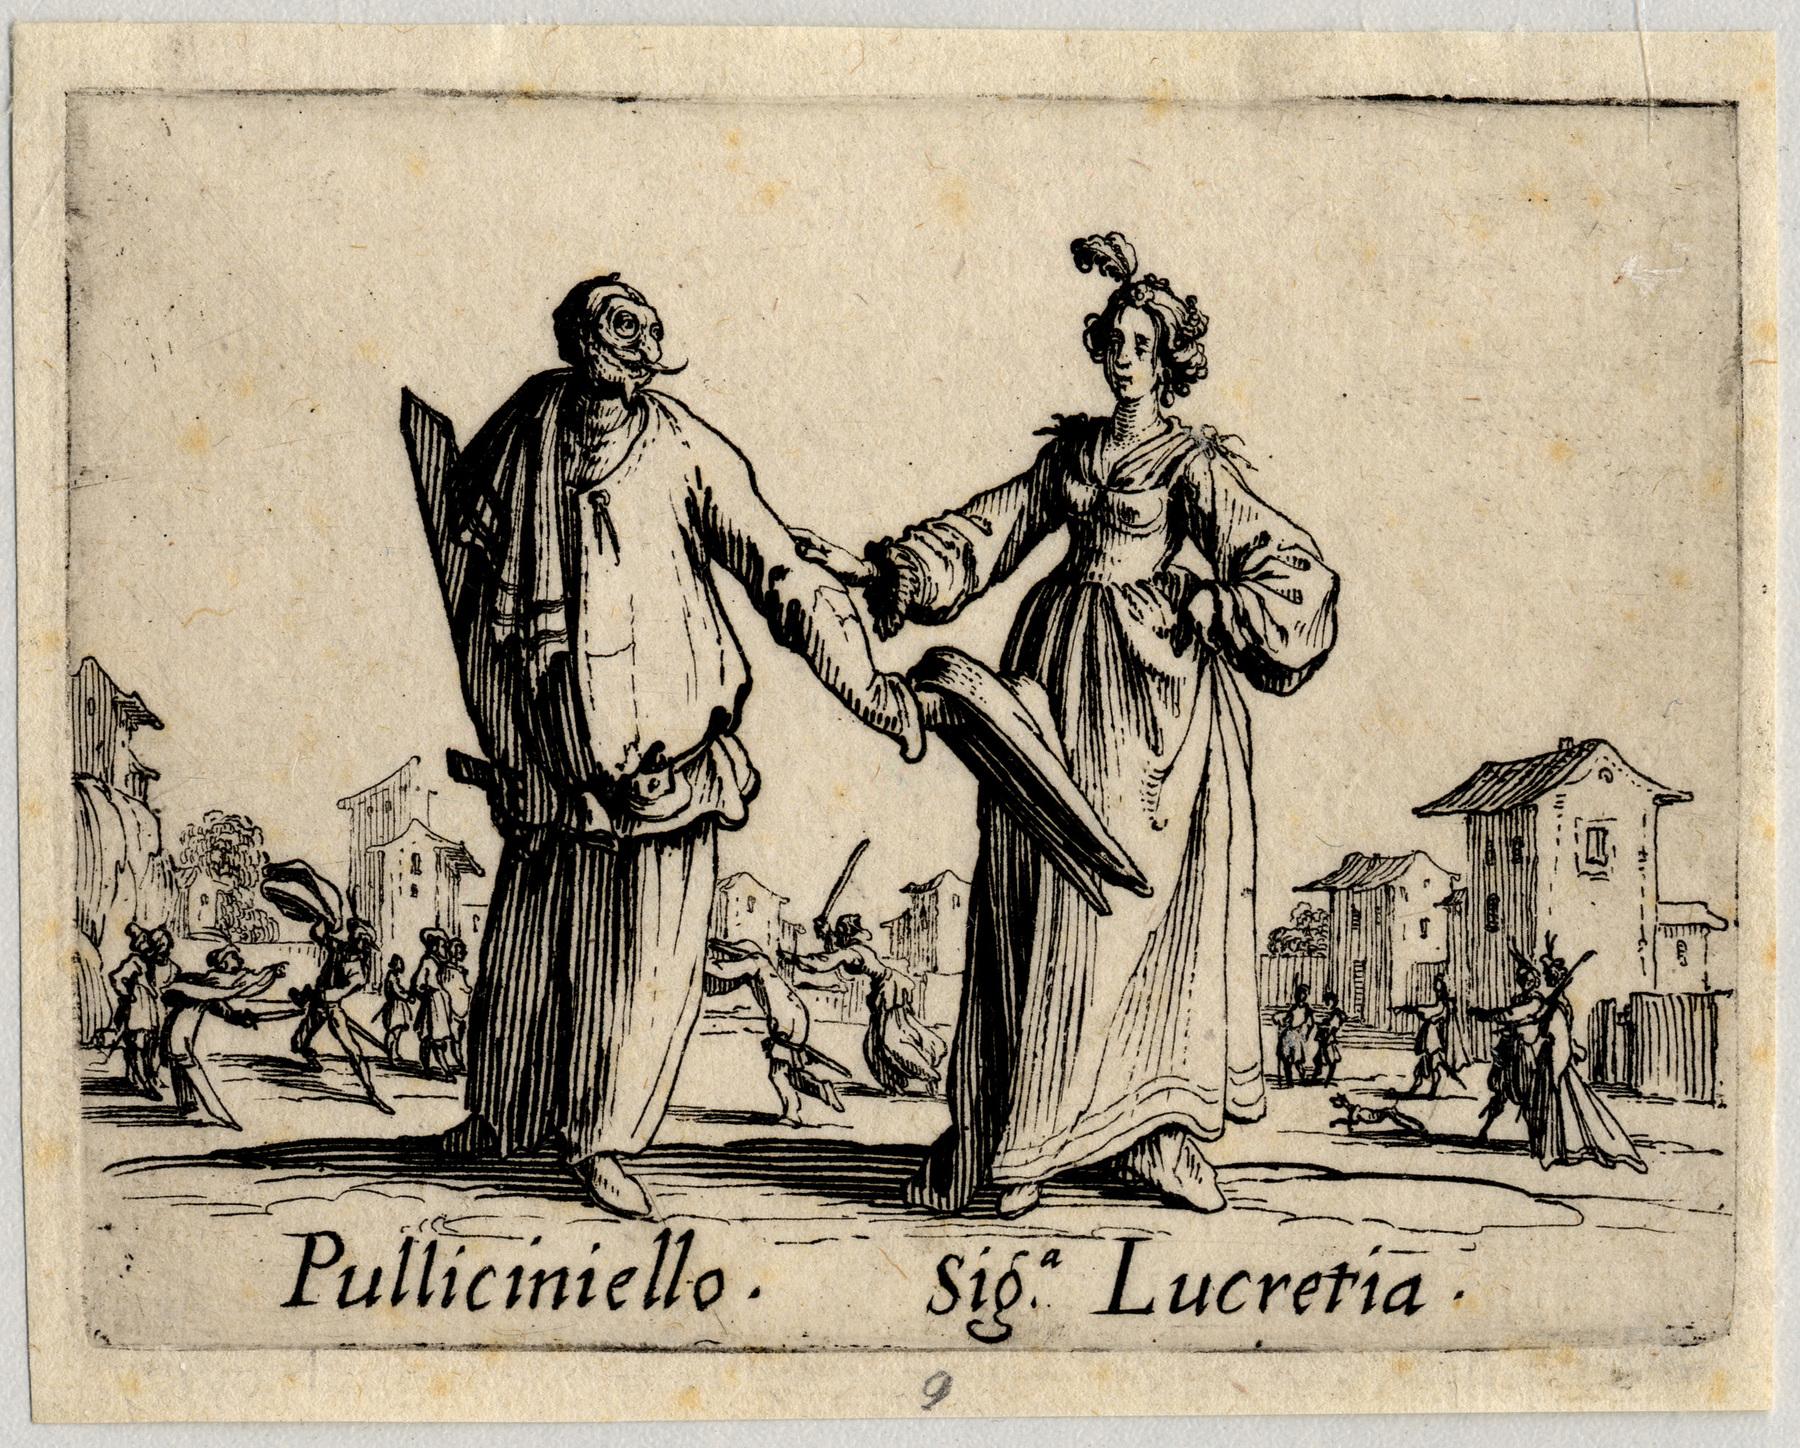 Contenu du Balli di Sfessania : Pulliciniello, signora Lucretia